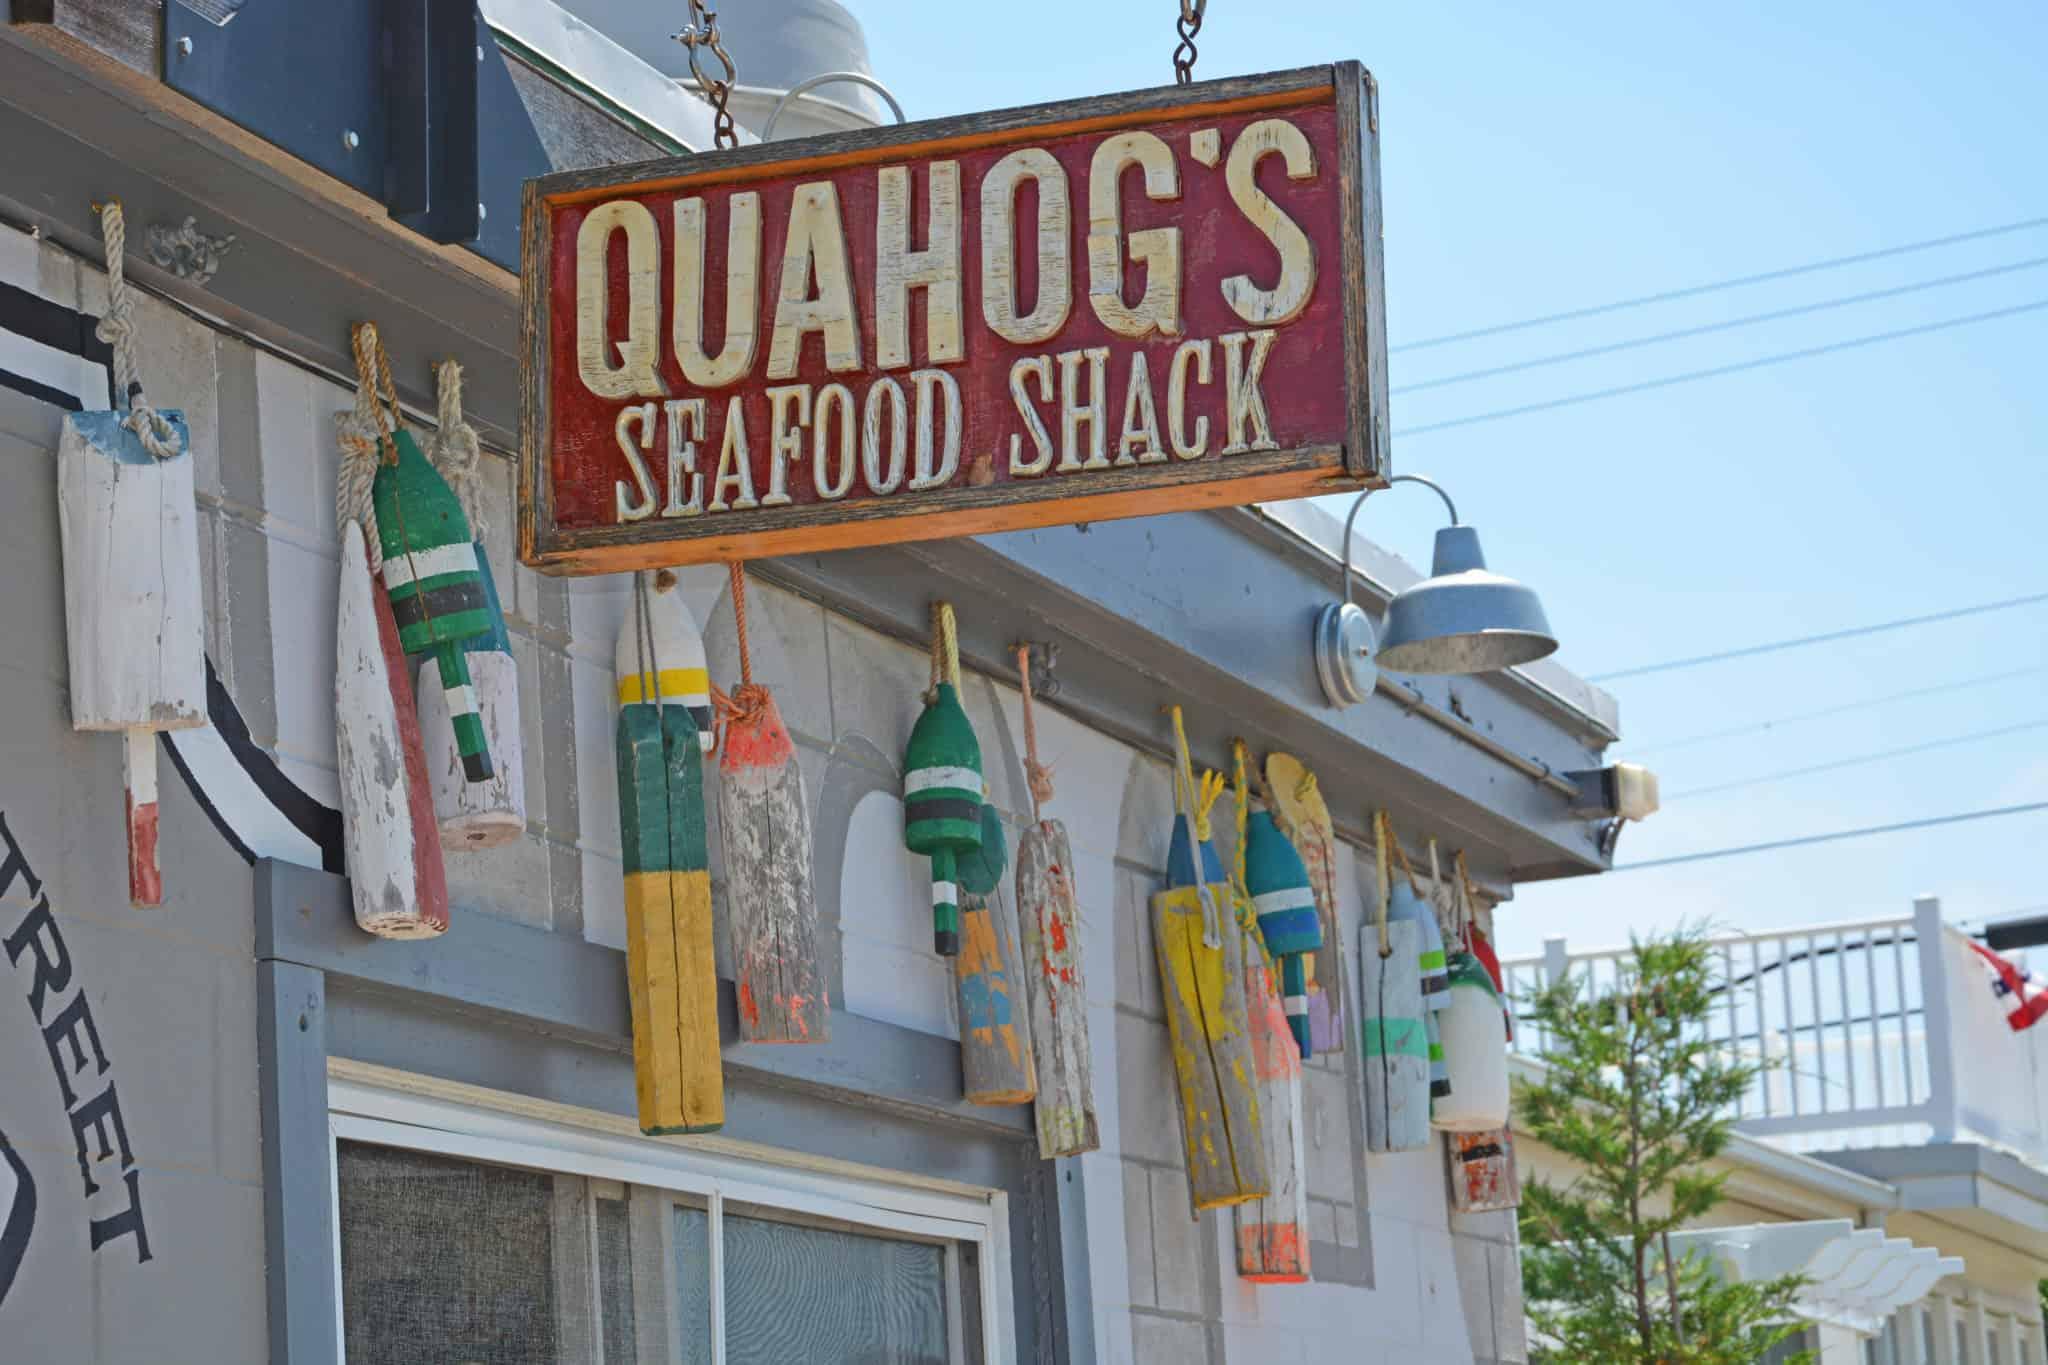 Quahog Seafood Shack